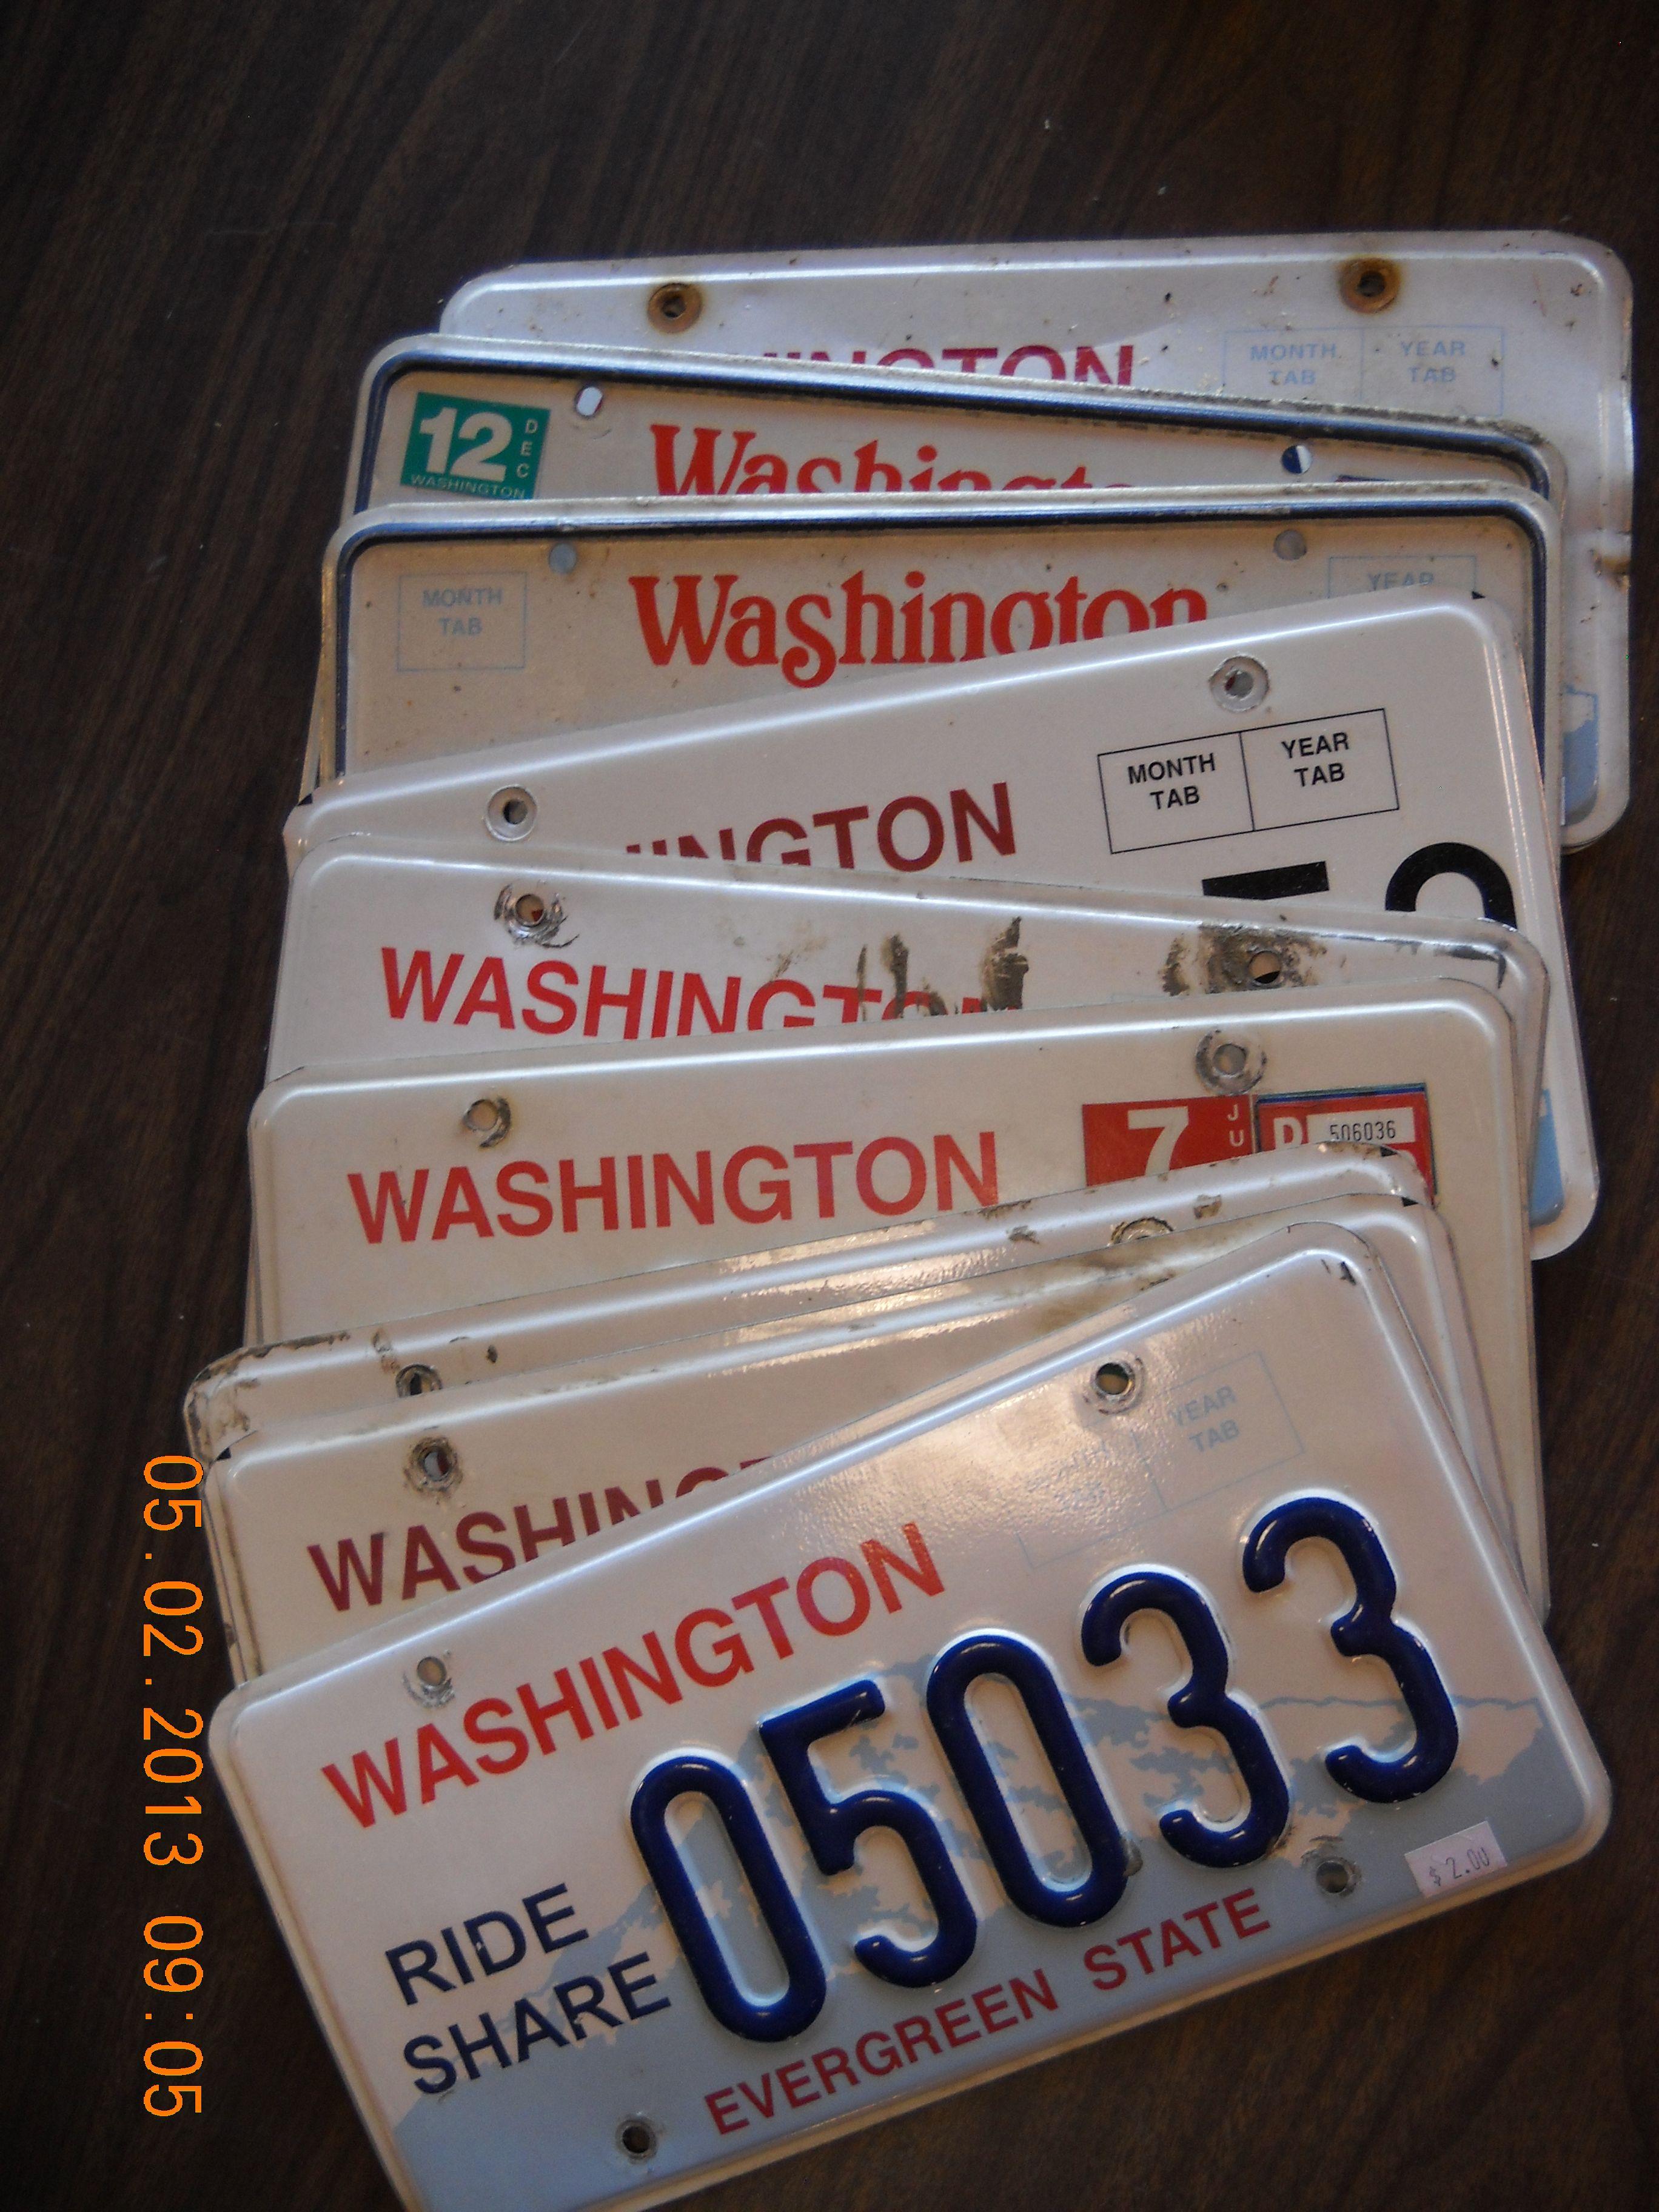 A recent history of Washington state license plates | The Habitat ...